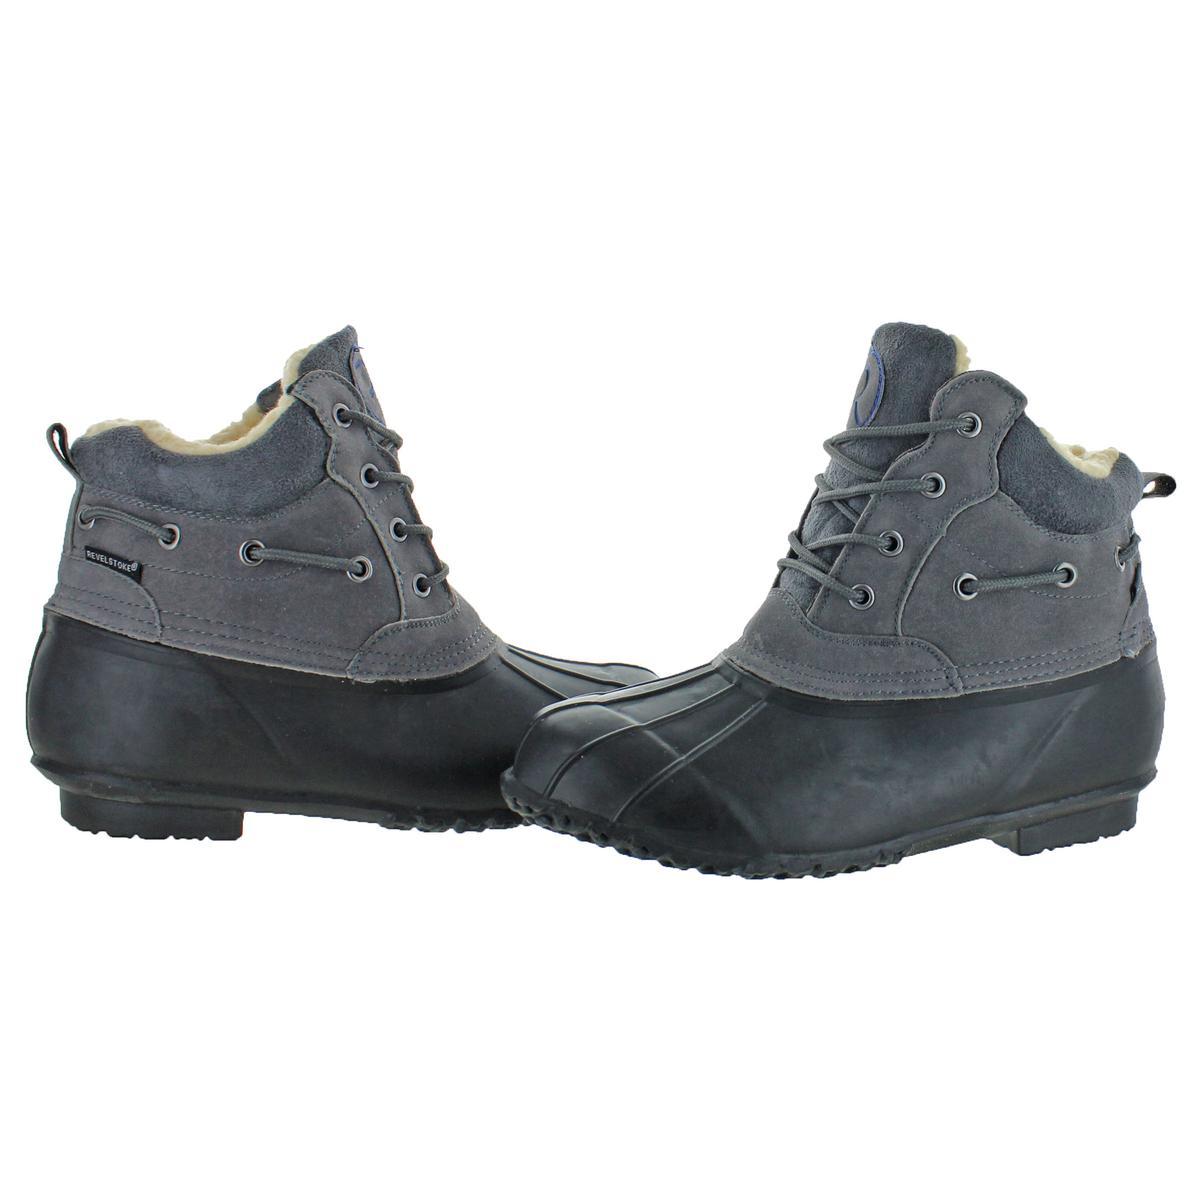 Revelstoke Men/'s Freeport Waterproof Cold Weather Duck Toe Winter Snow Boots